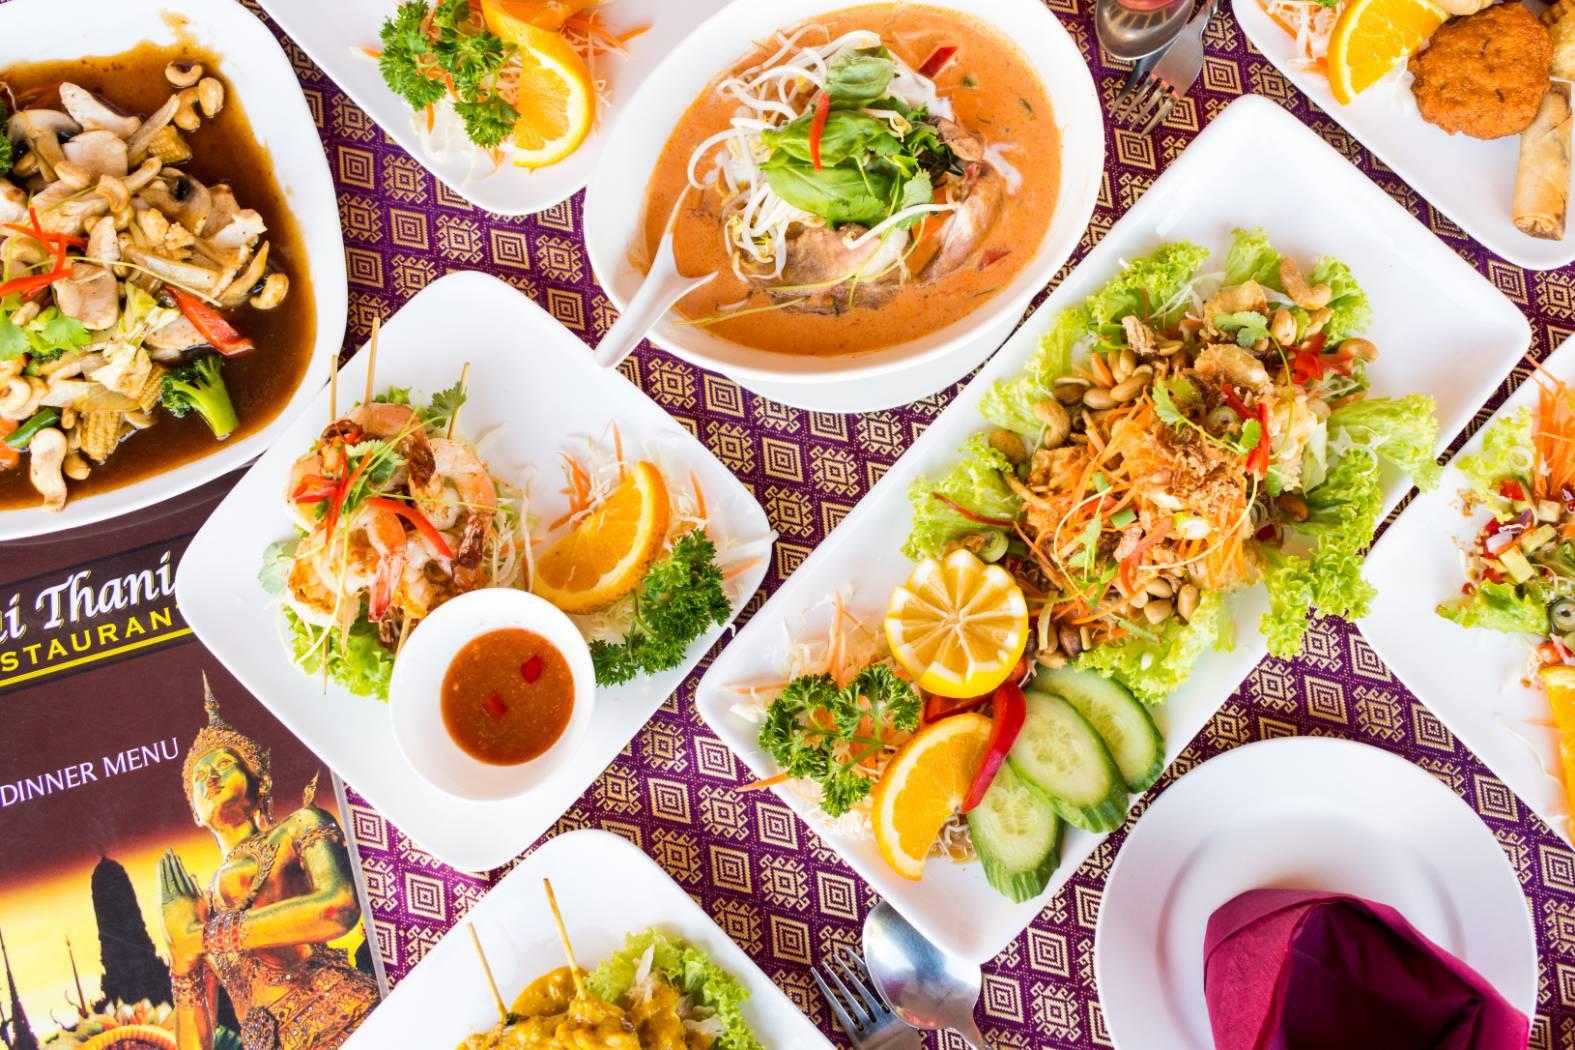 Thai%20thani%20restaurant%20tauranga%20%283%29_1575x1050